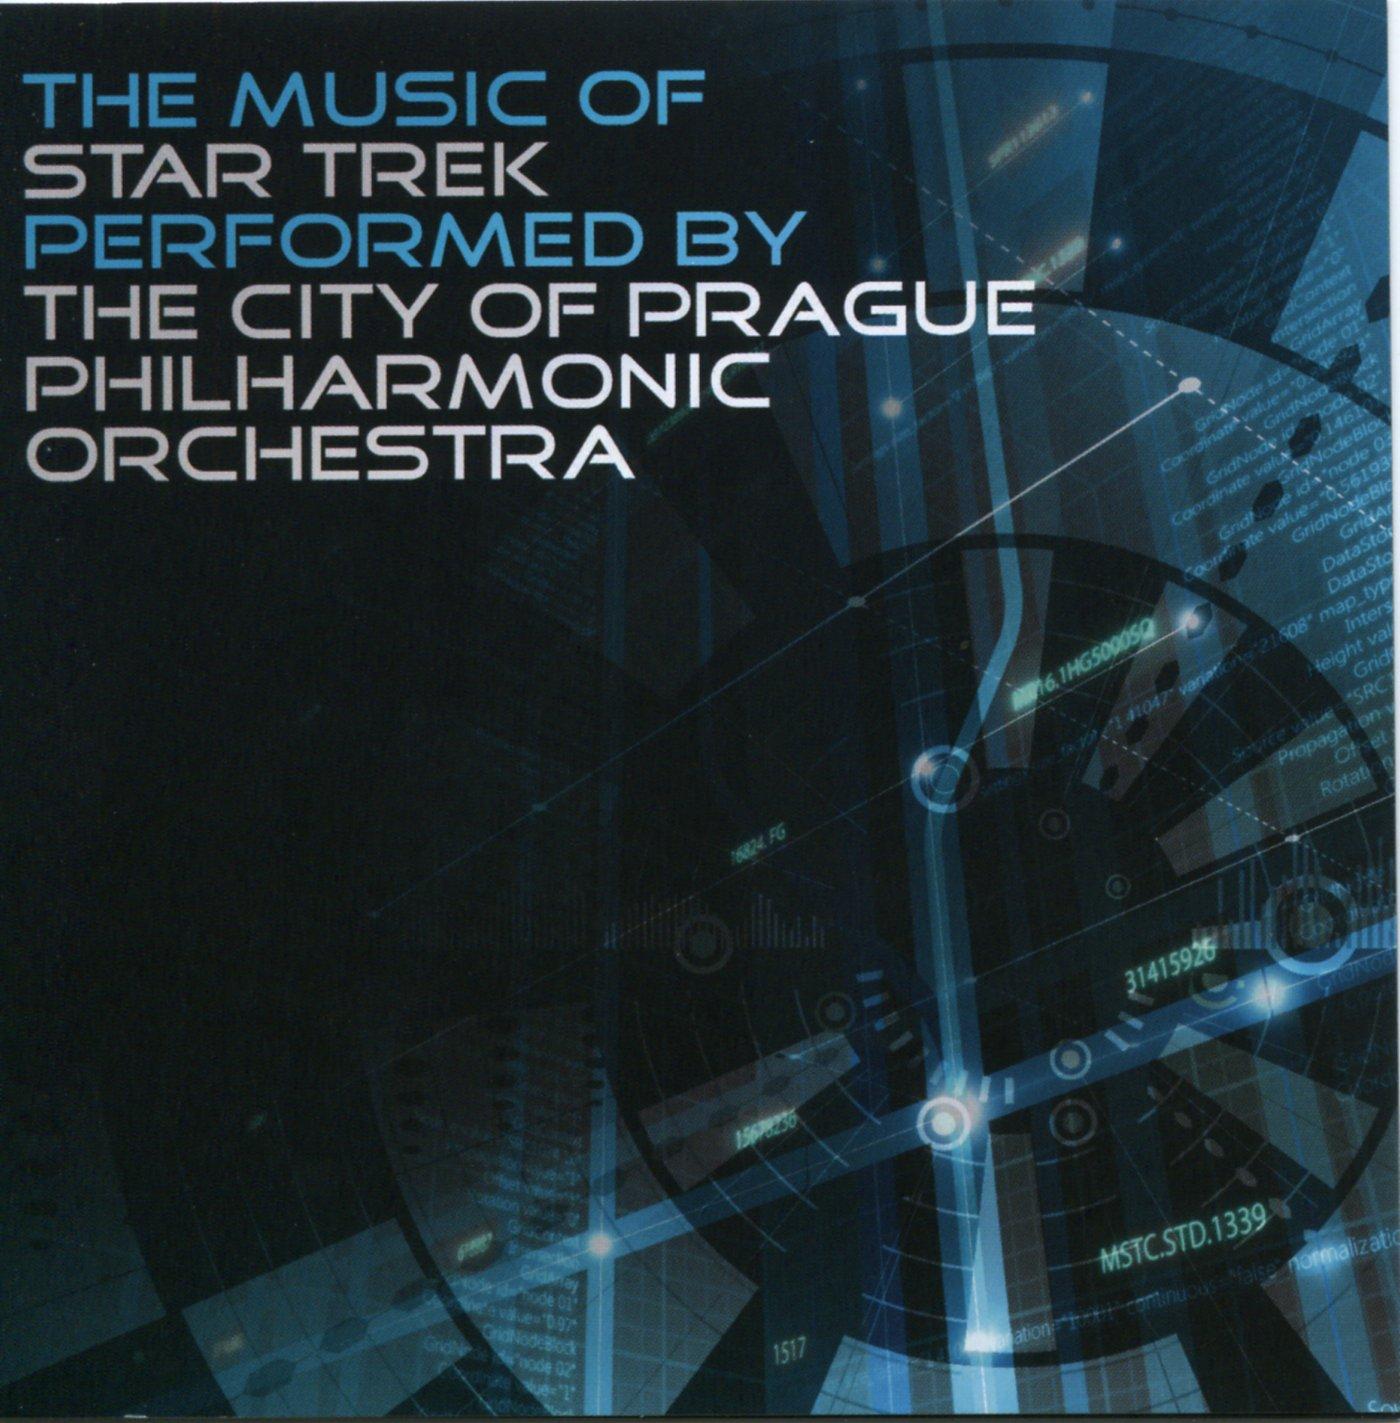 Music of Star Trek by Silva America